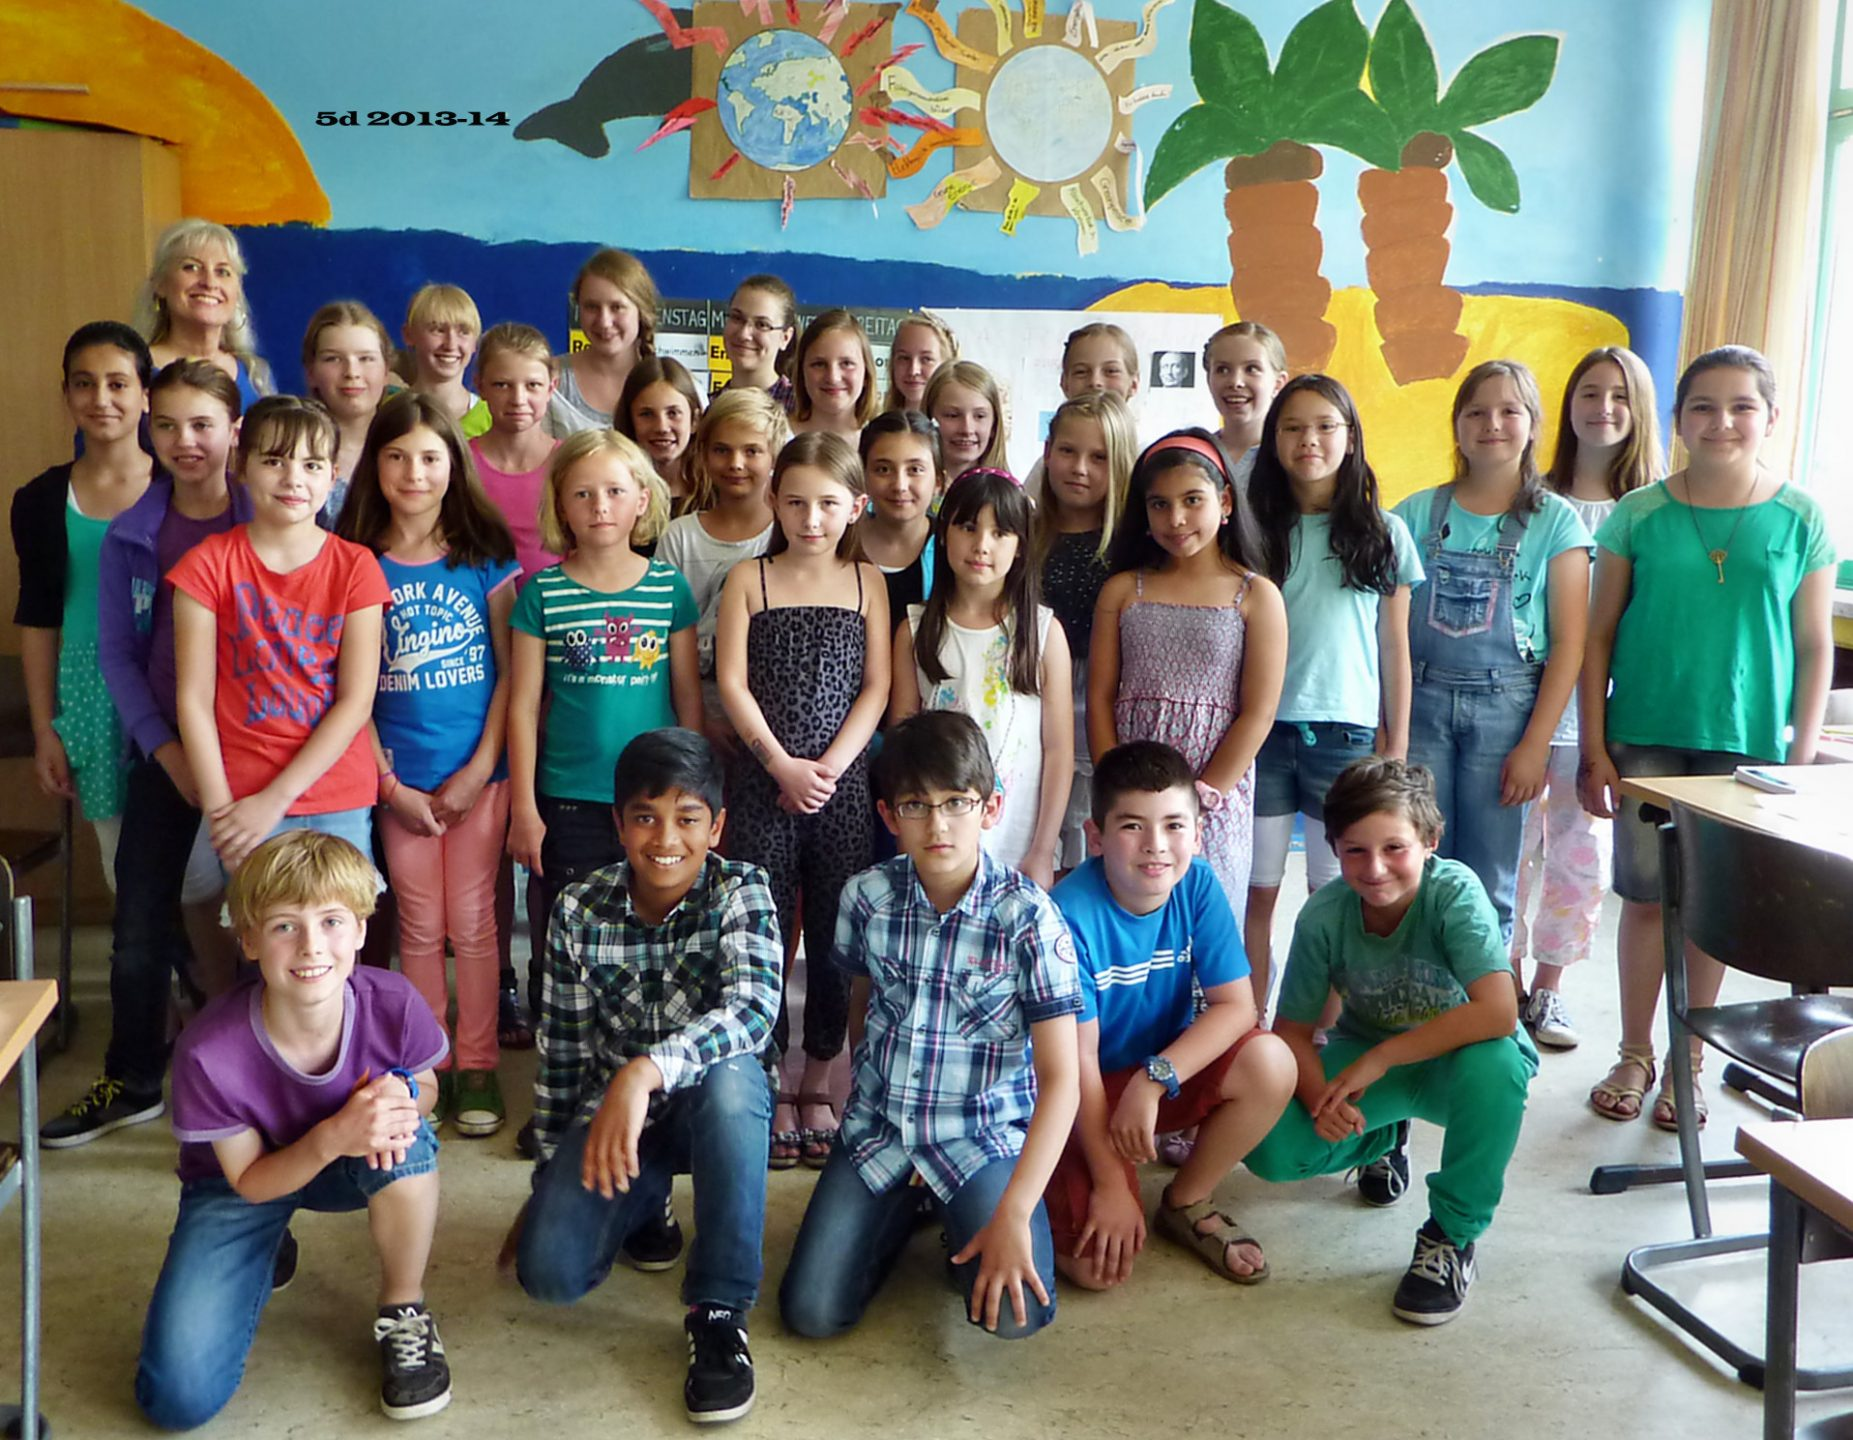 Klasse 5d 2013/14